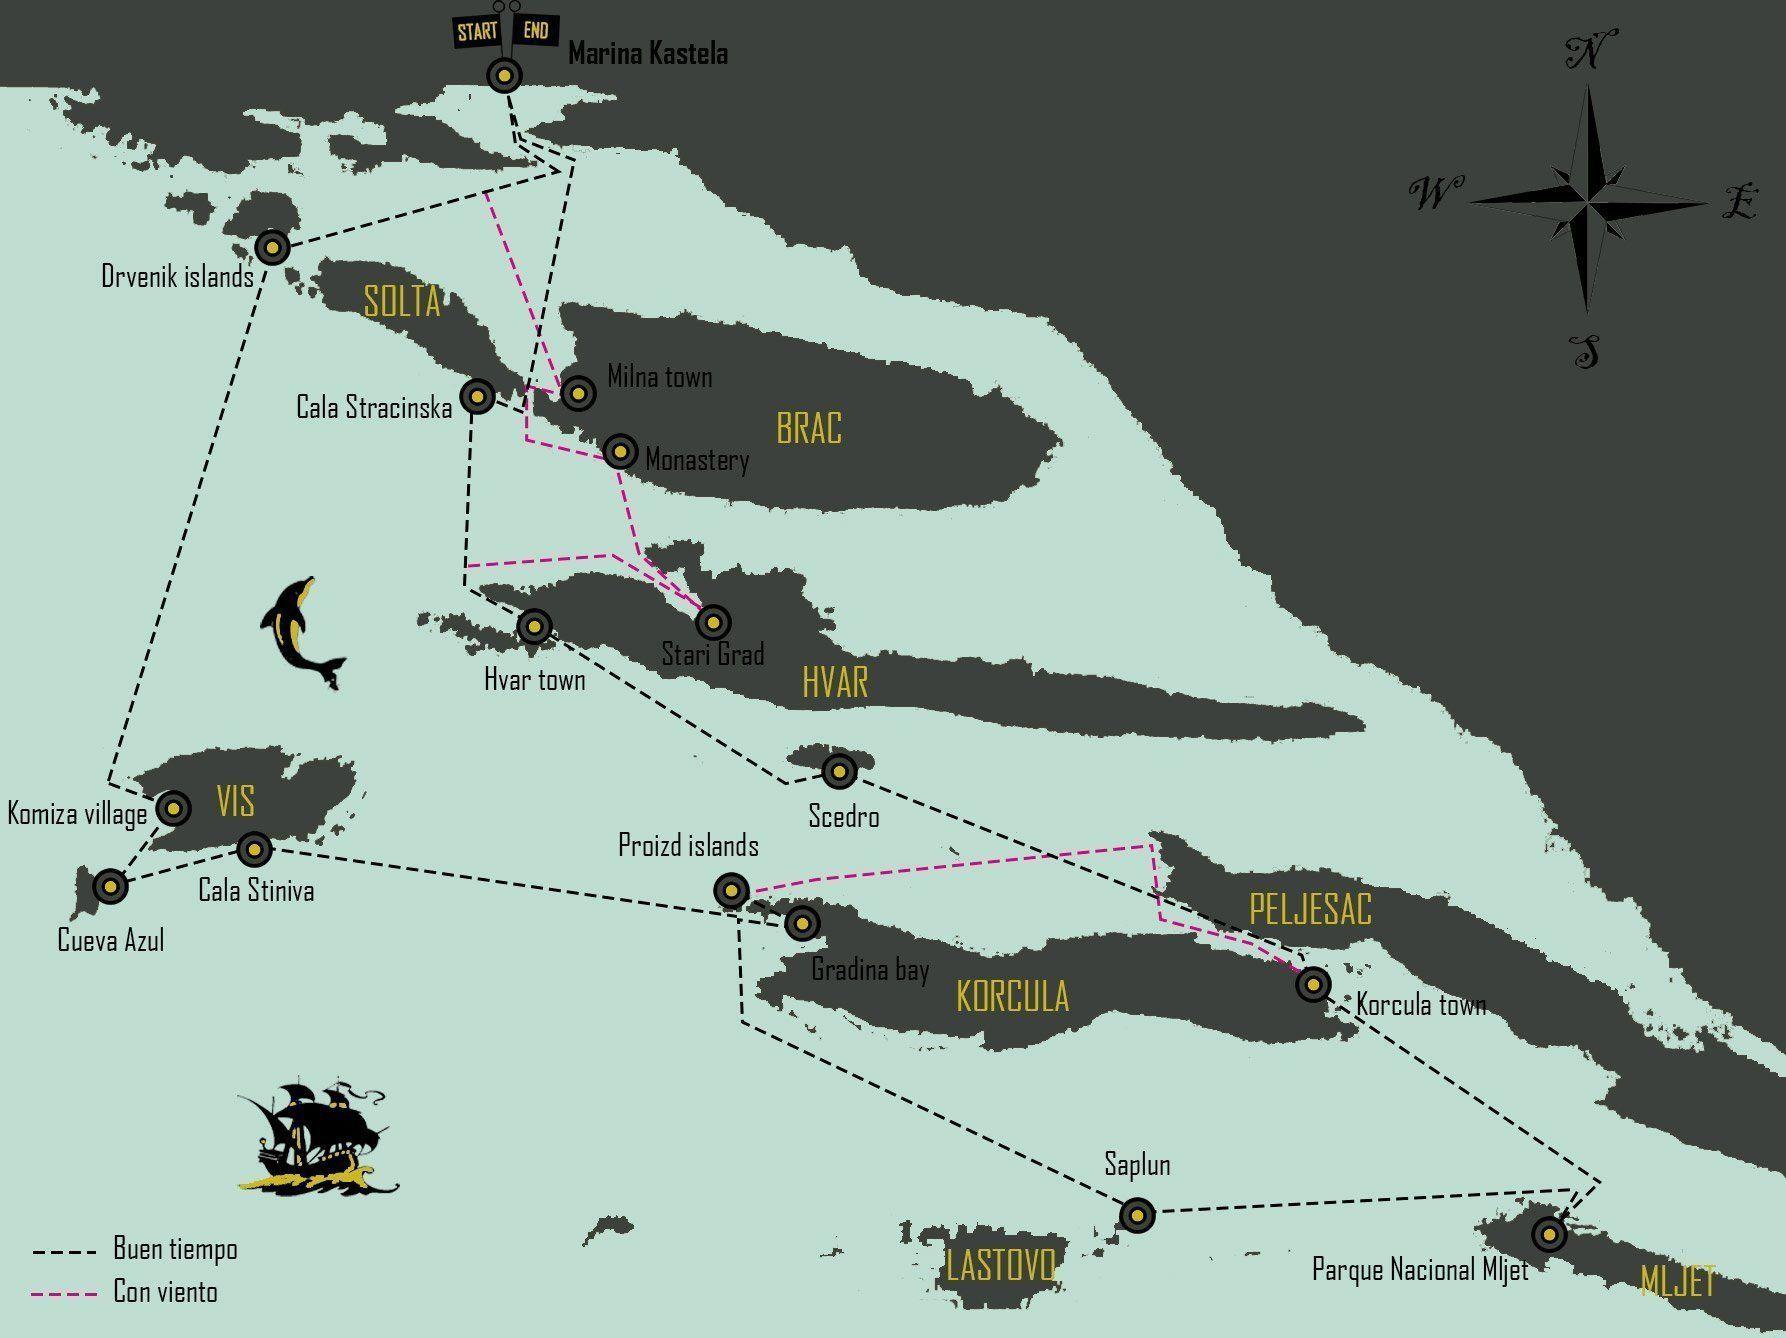 mapa-travesia-velero-croacia-islas-dalmatas